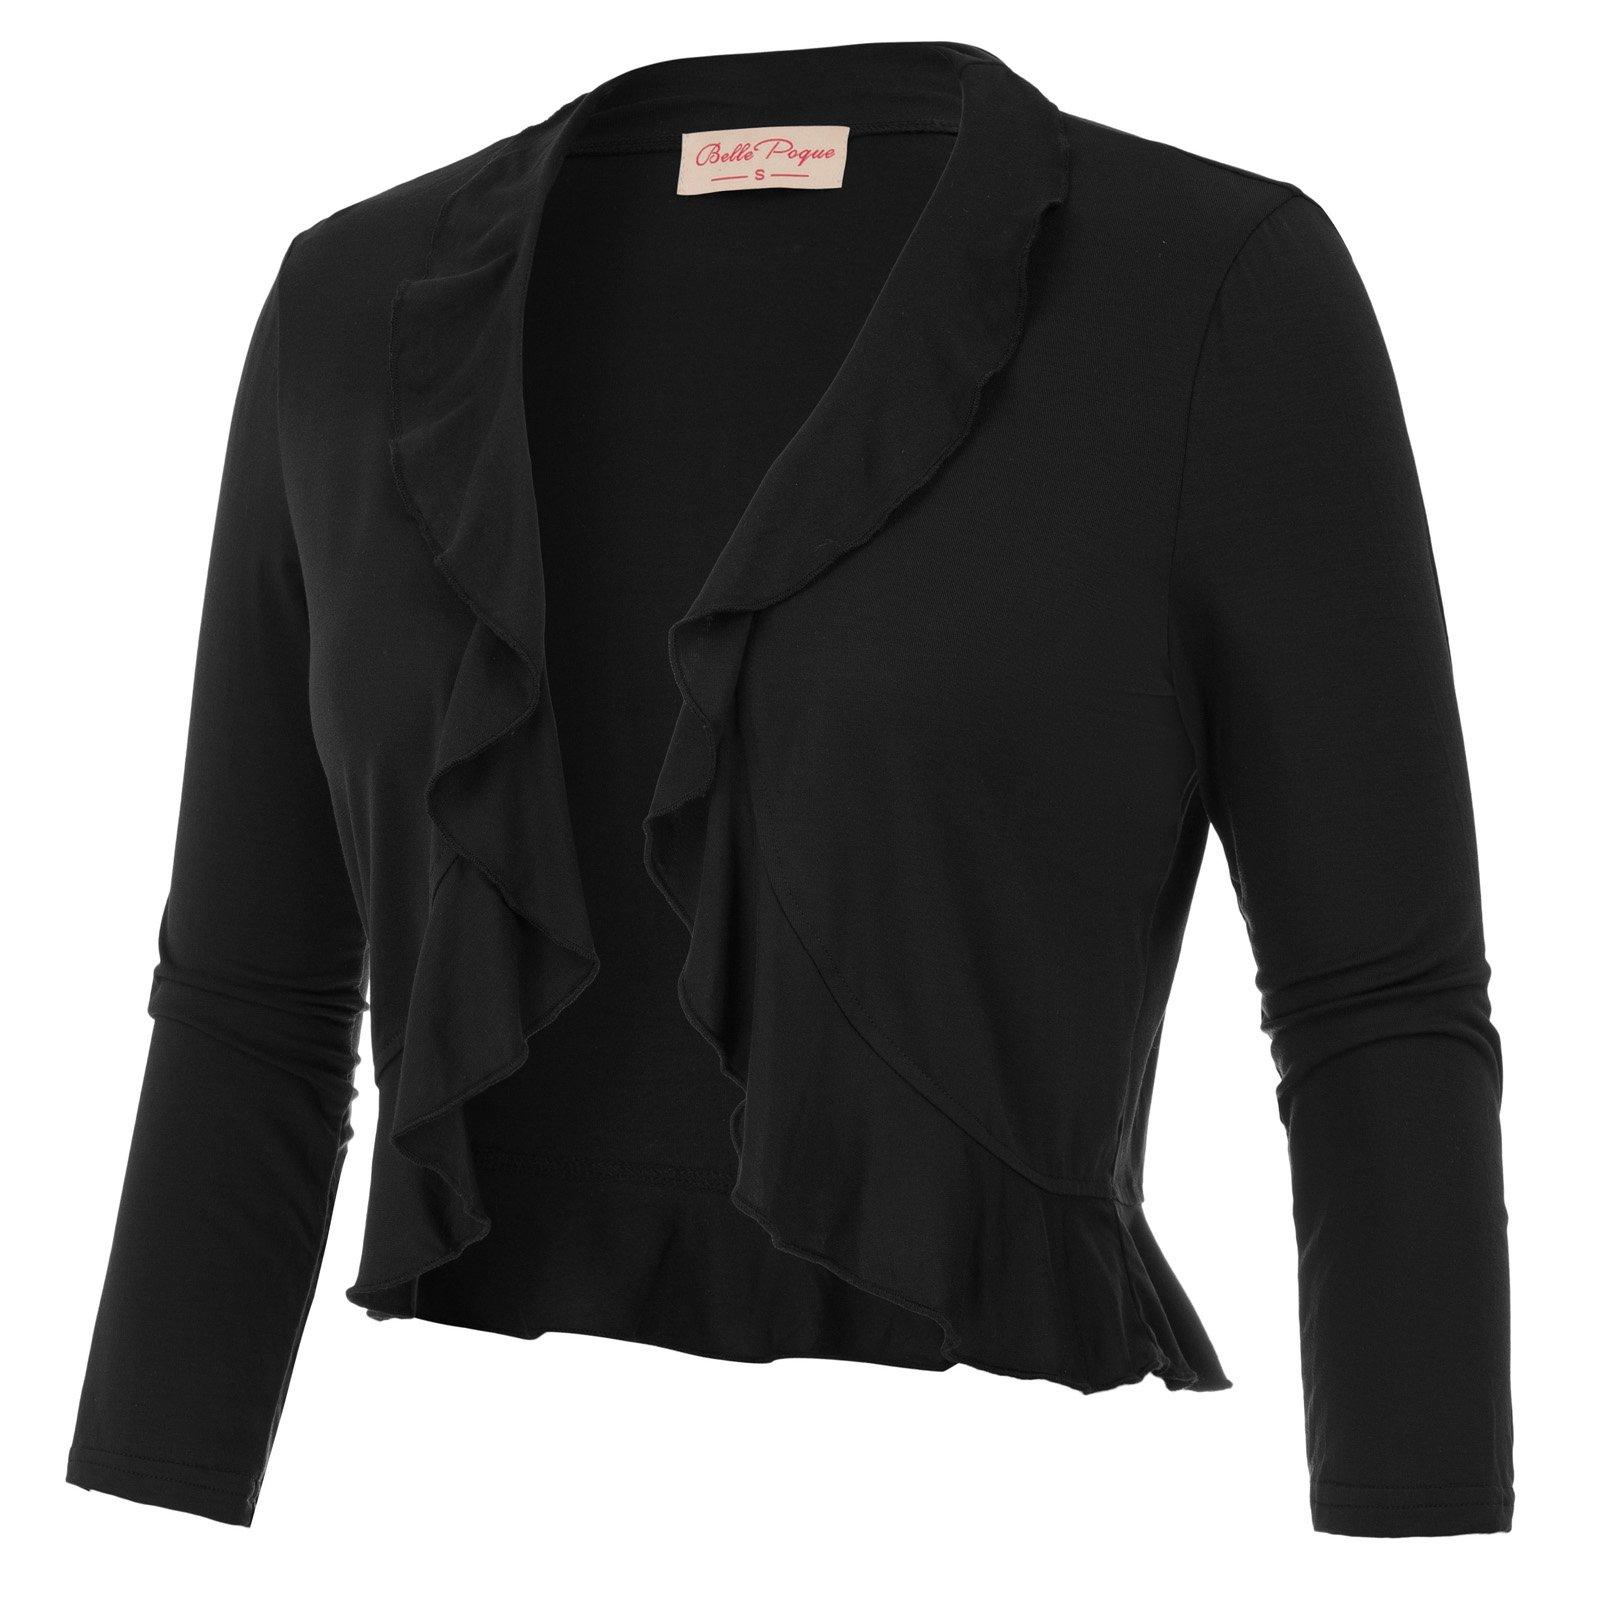 Lady 3/4 Sleeve Ruffle Shrug Bolero Cover-up (S,Black 592)